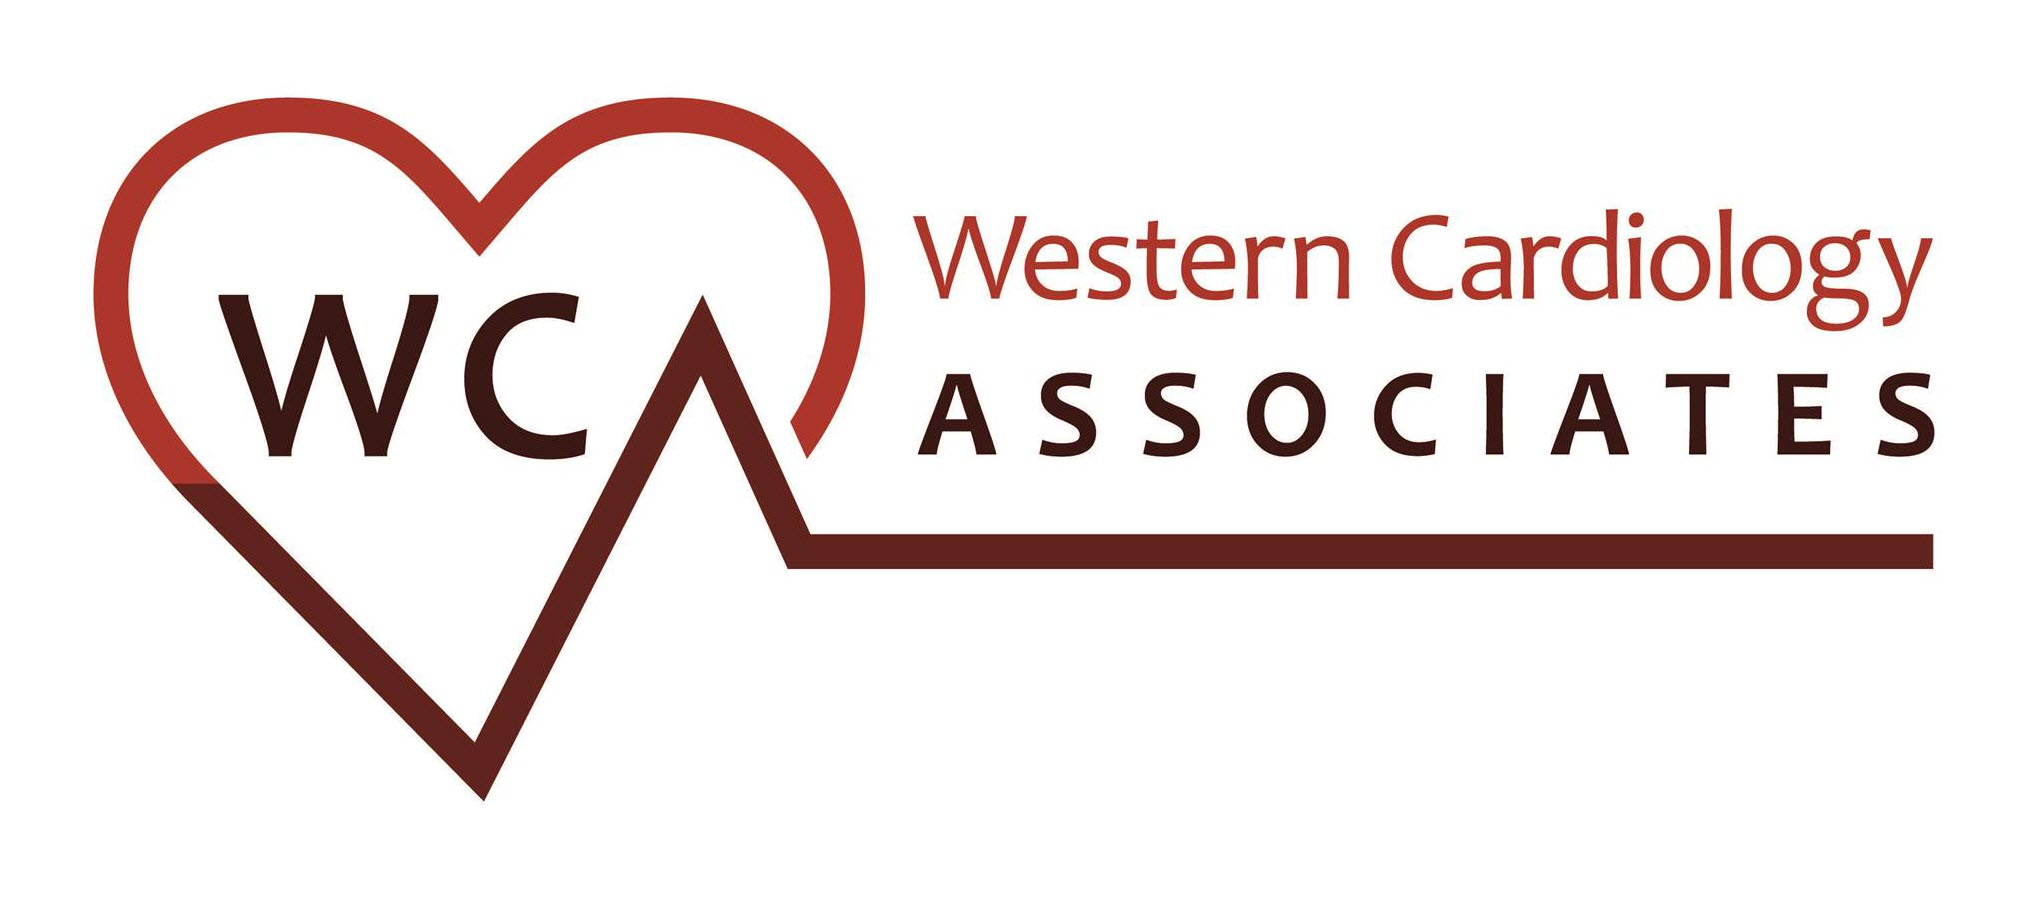 Western Cardiology Associates